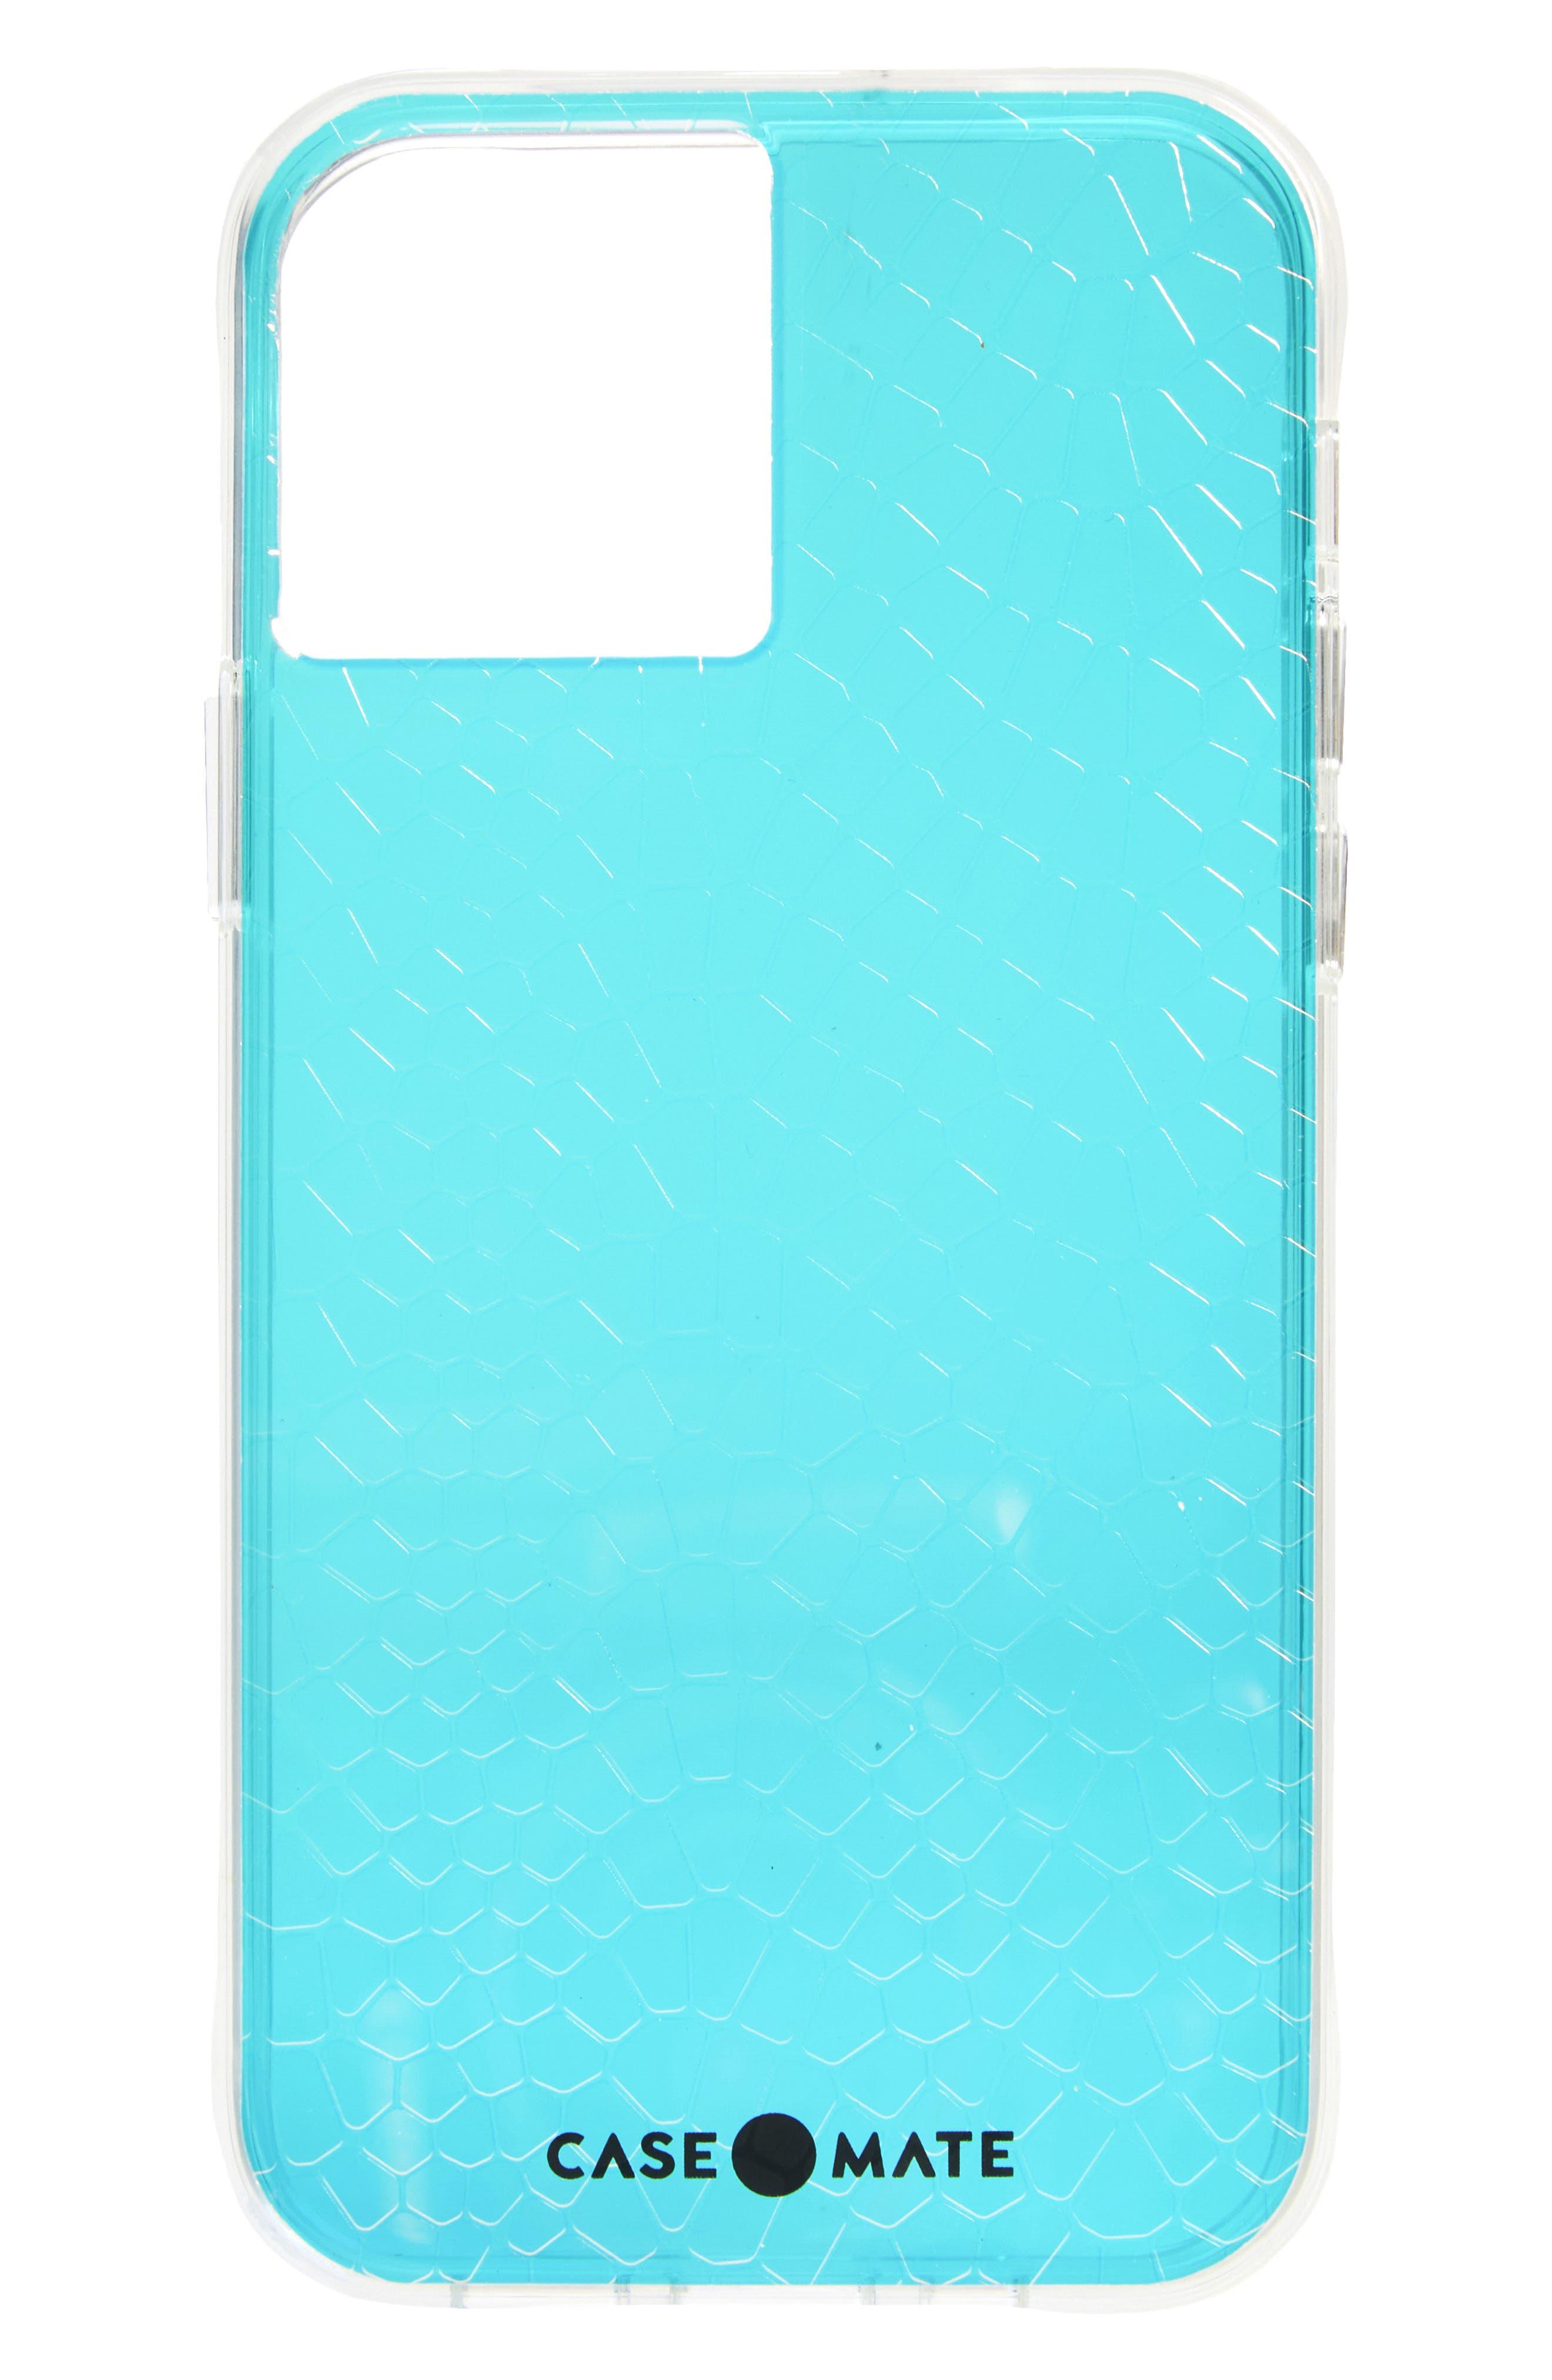 Case-Mate Iridescent Snakeskin Textured Iphone 12/12 Pro Case